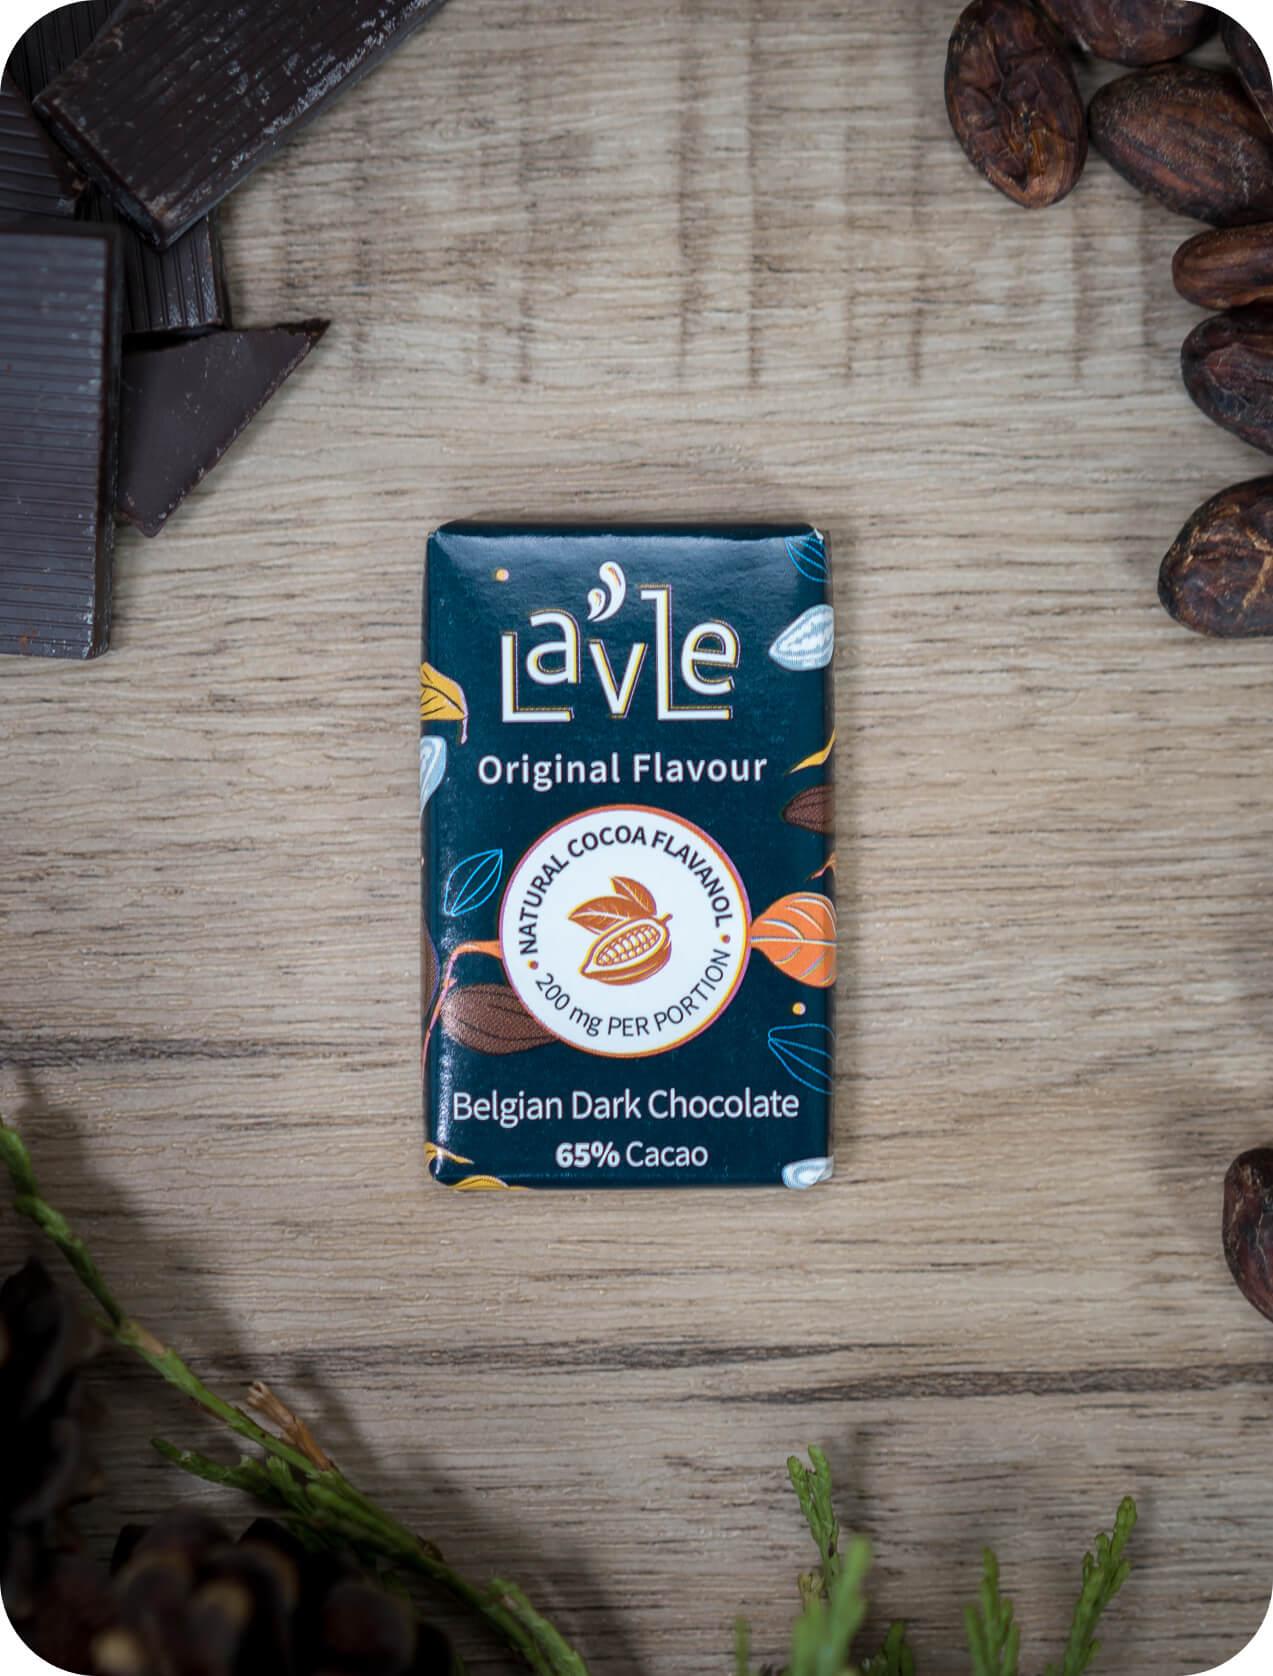 Lavle-Flavanol-Chocolate-Original-Flavour